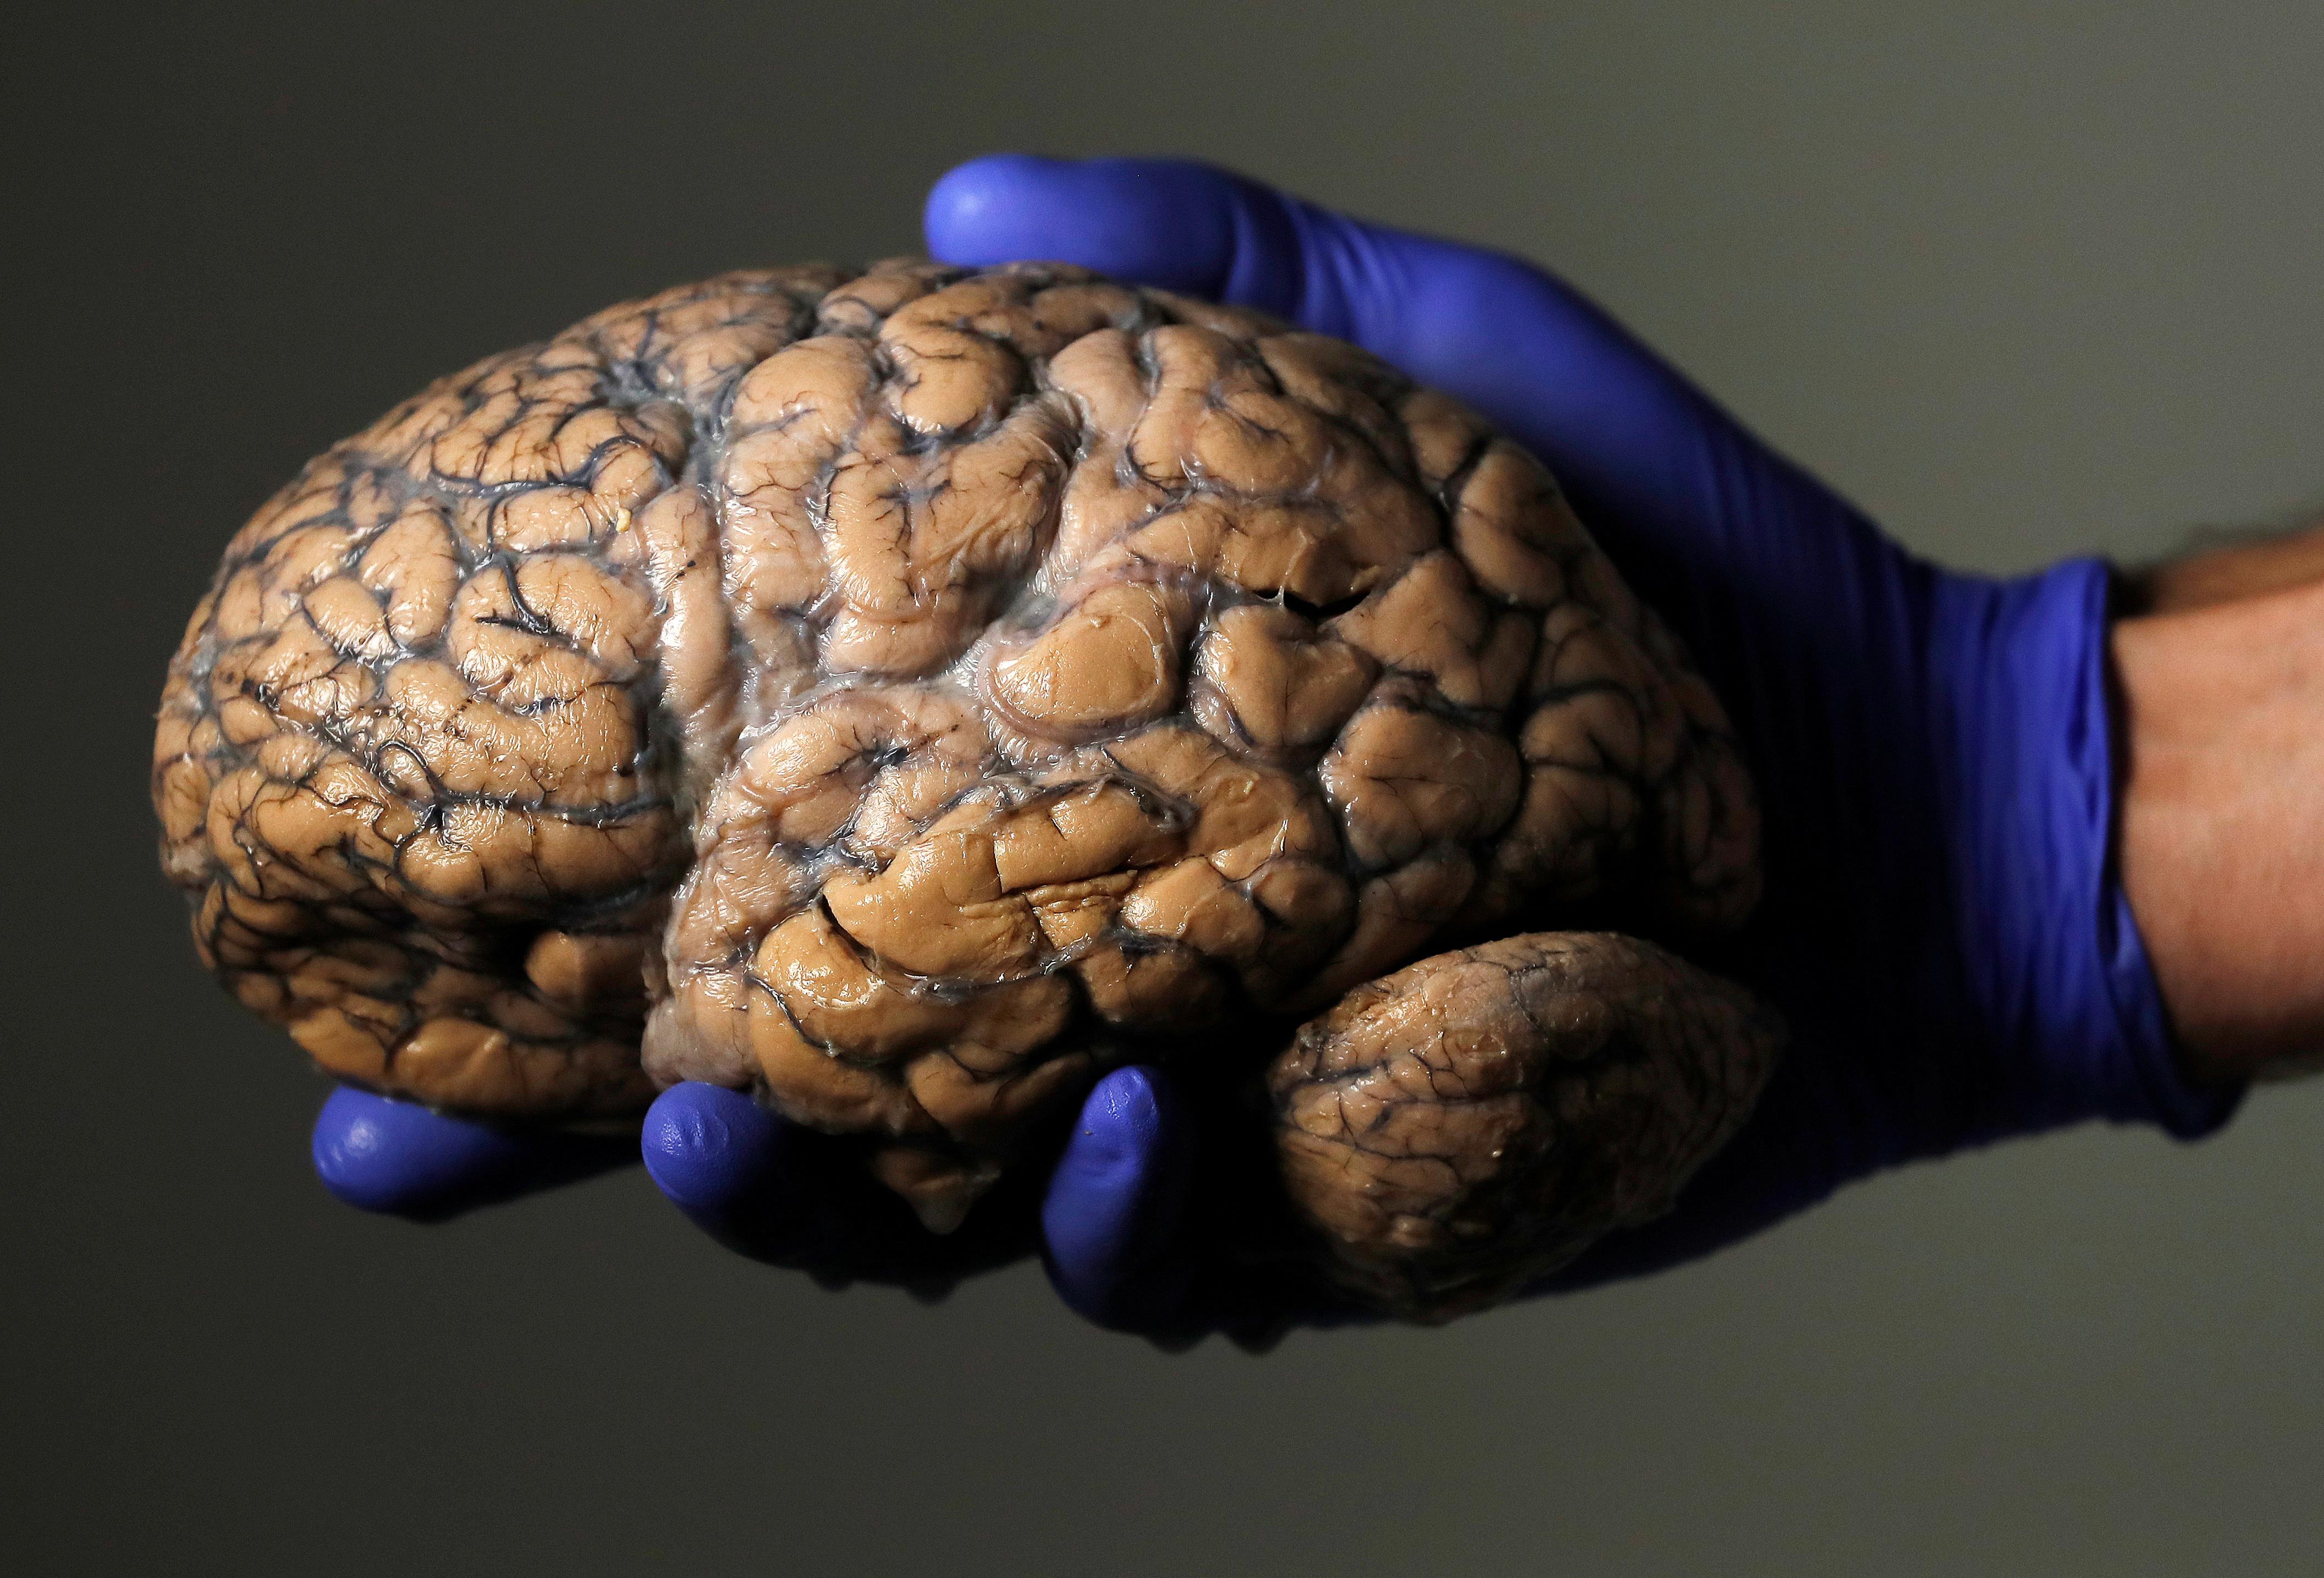 STUDY Shape of  brain influences political views